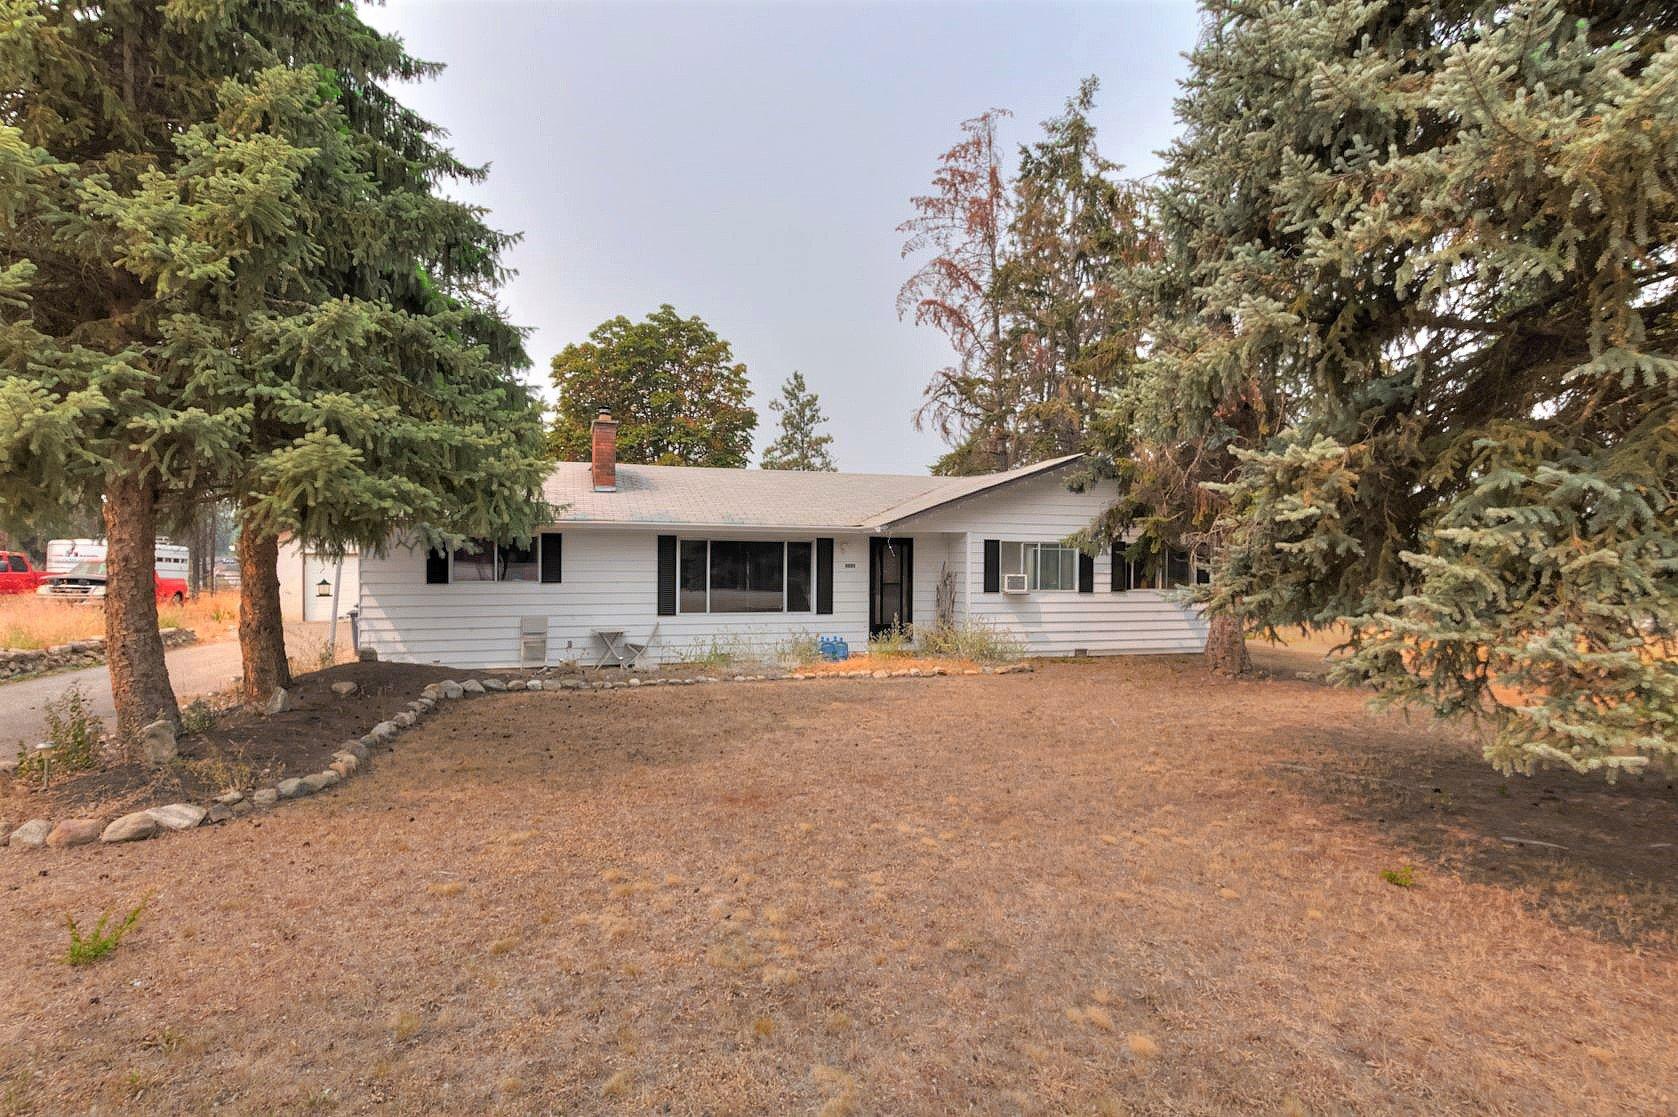 Main Photo: 4090 Field Road in Kelowna: South East Kelowna House for sale (Central Okanagan)  : MLS®# 10140100